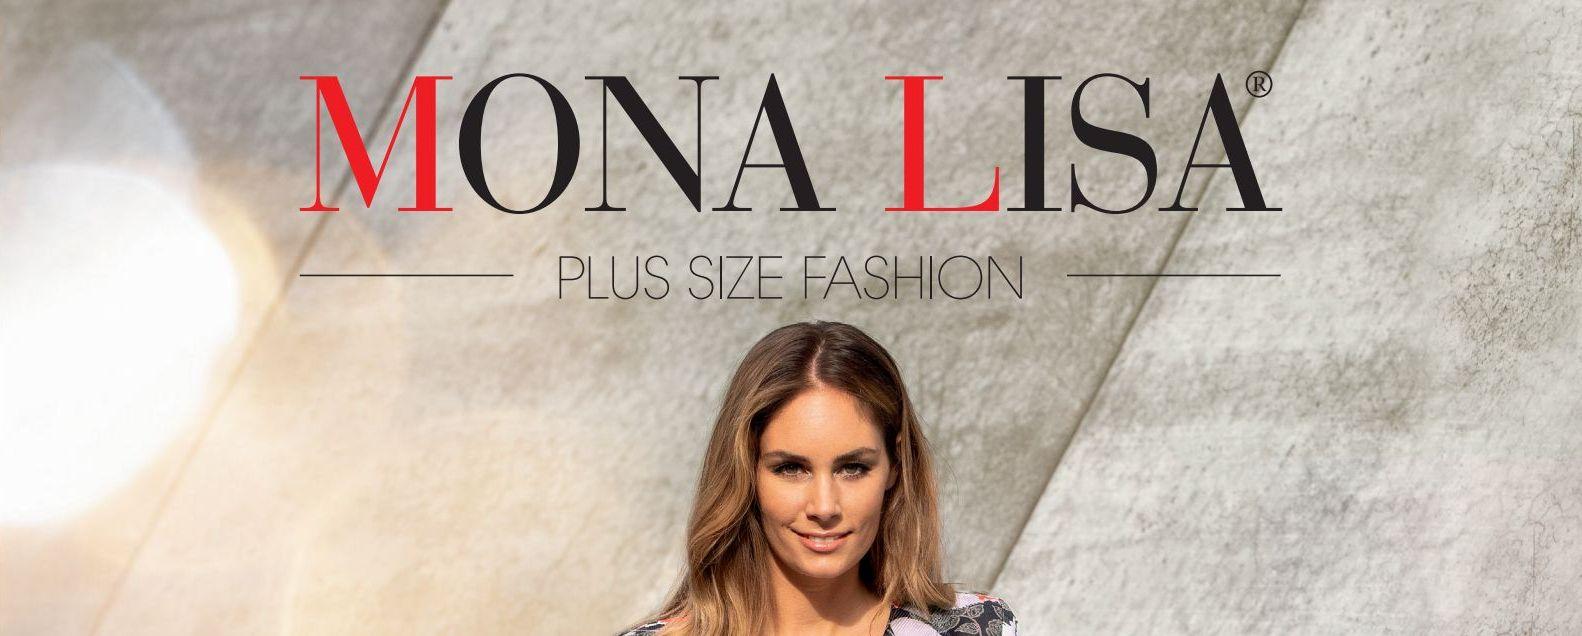 Mona Lisa Mode Monalisa Kleidung Online Shop